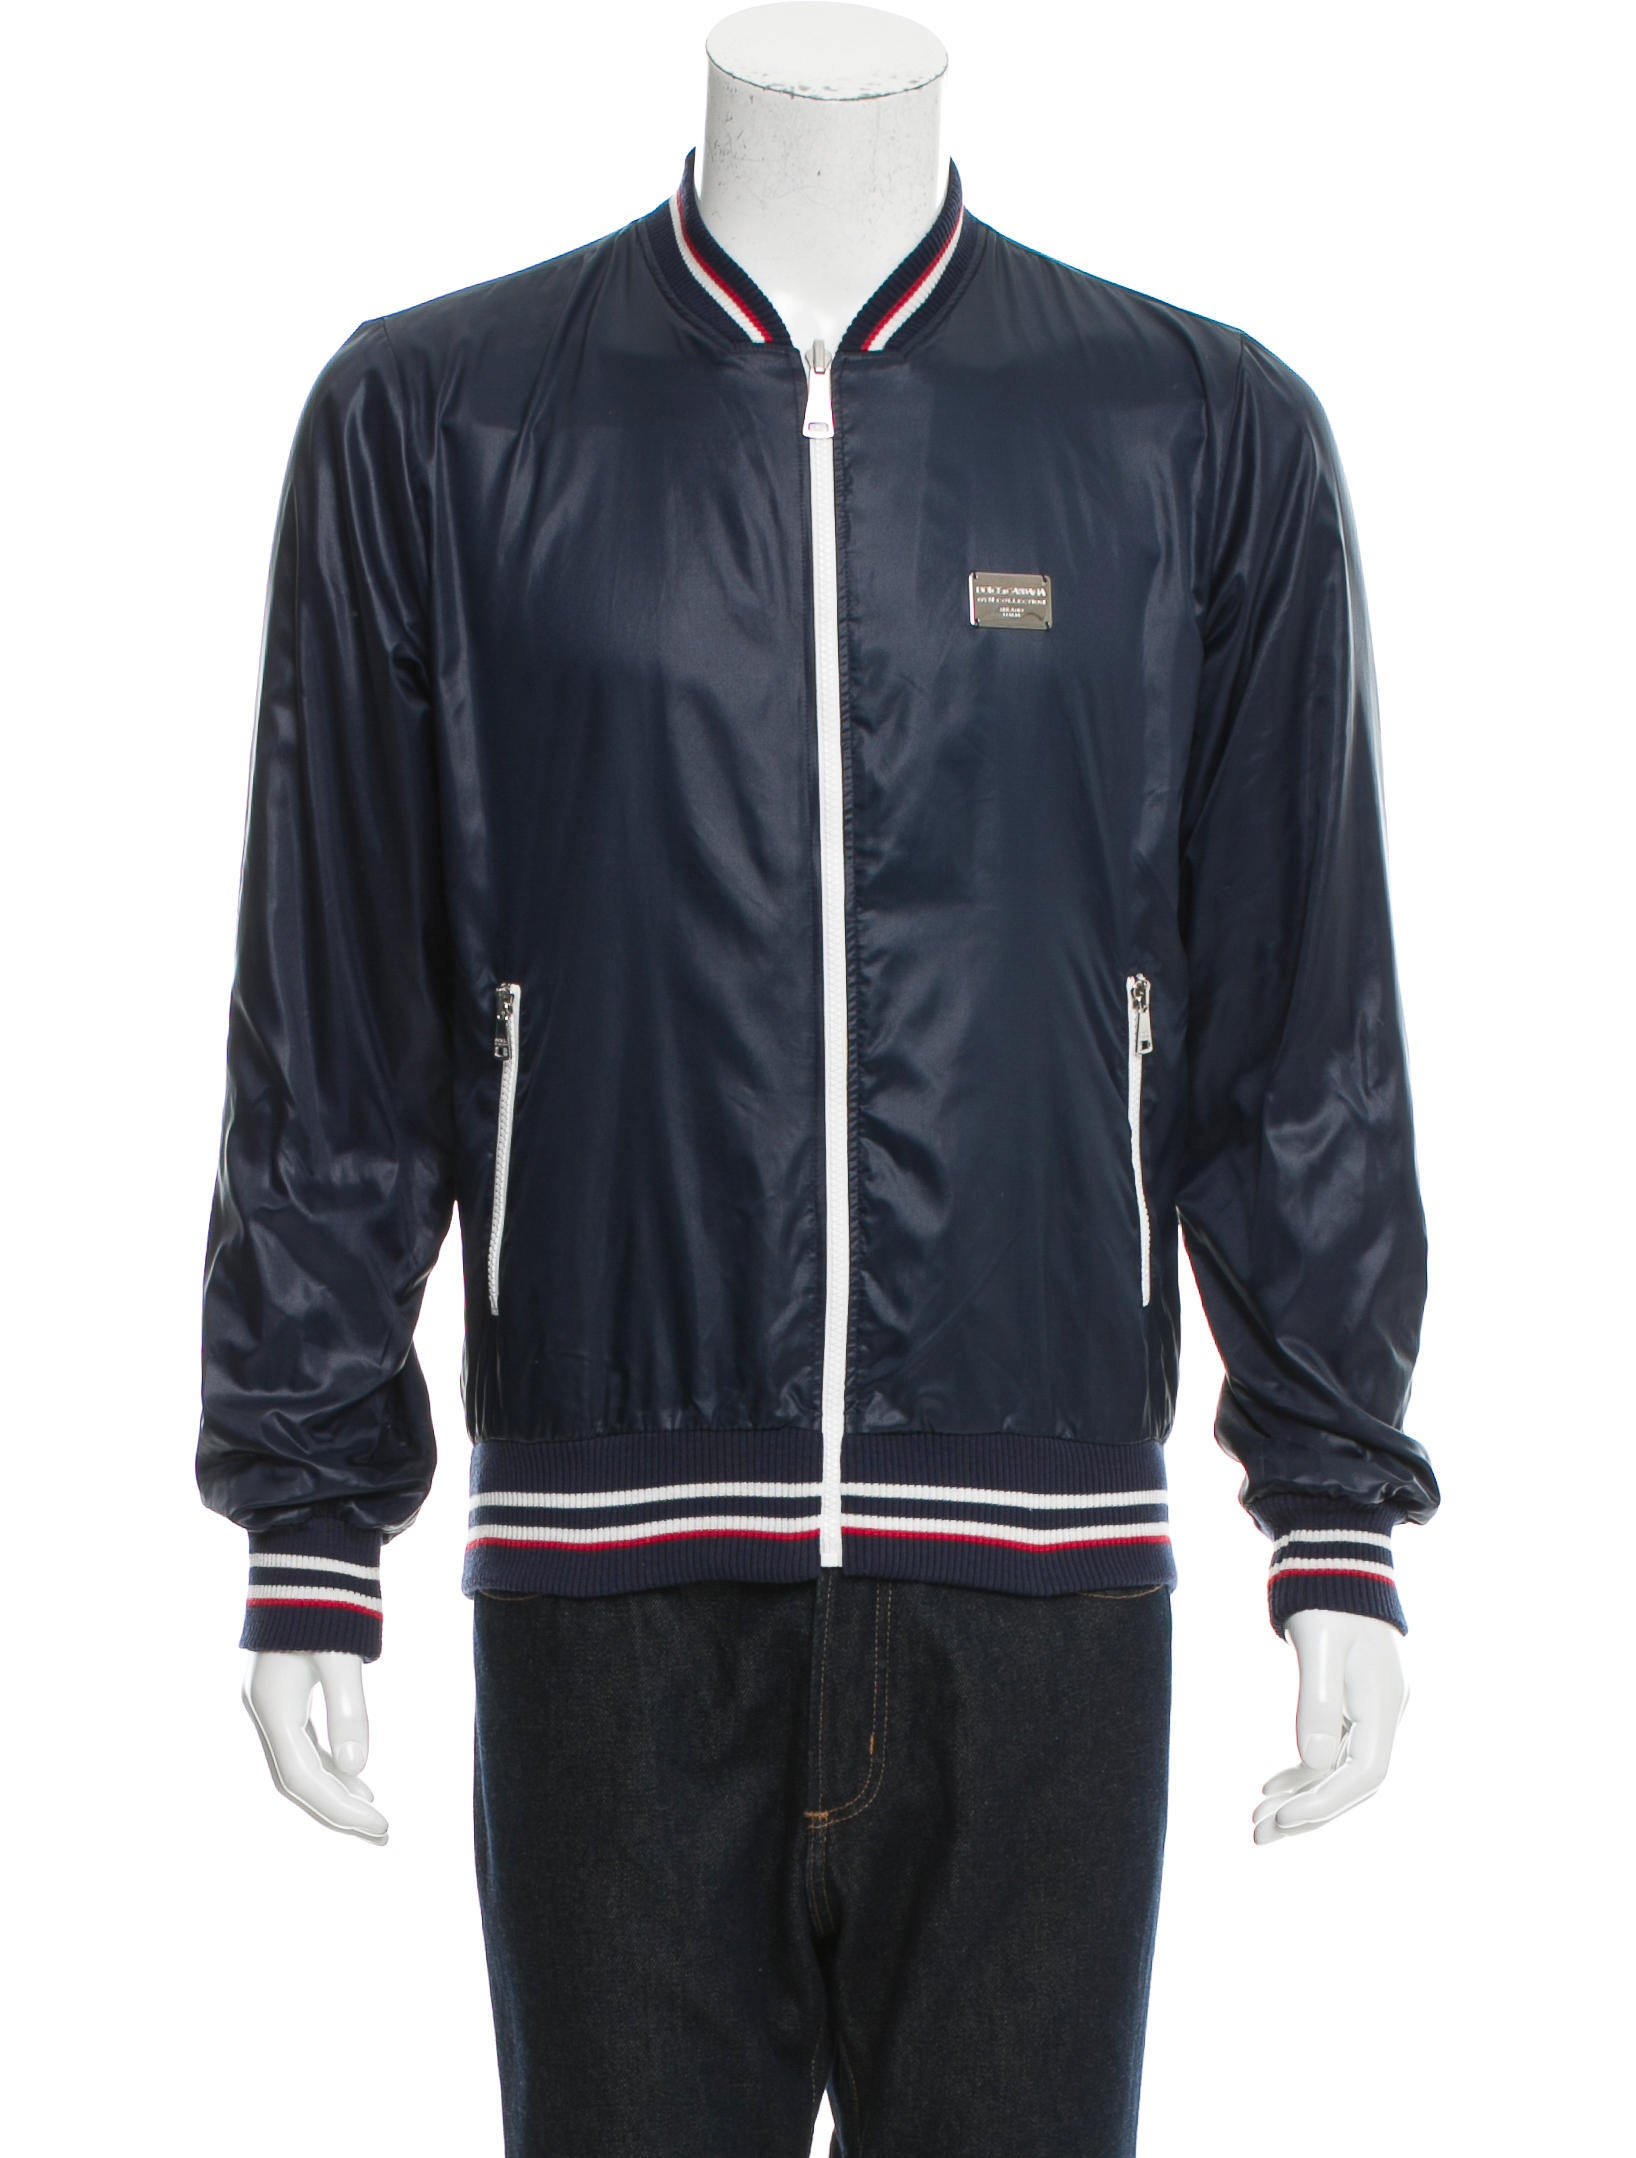 dolce gabbana windbreaker bomber jacket clothing dag82657 the realreal. Black Bedroom Furniture Sets. Home Design Ideas